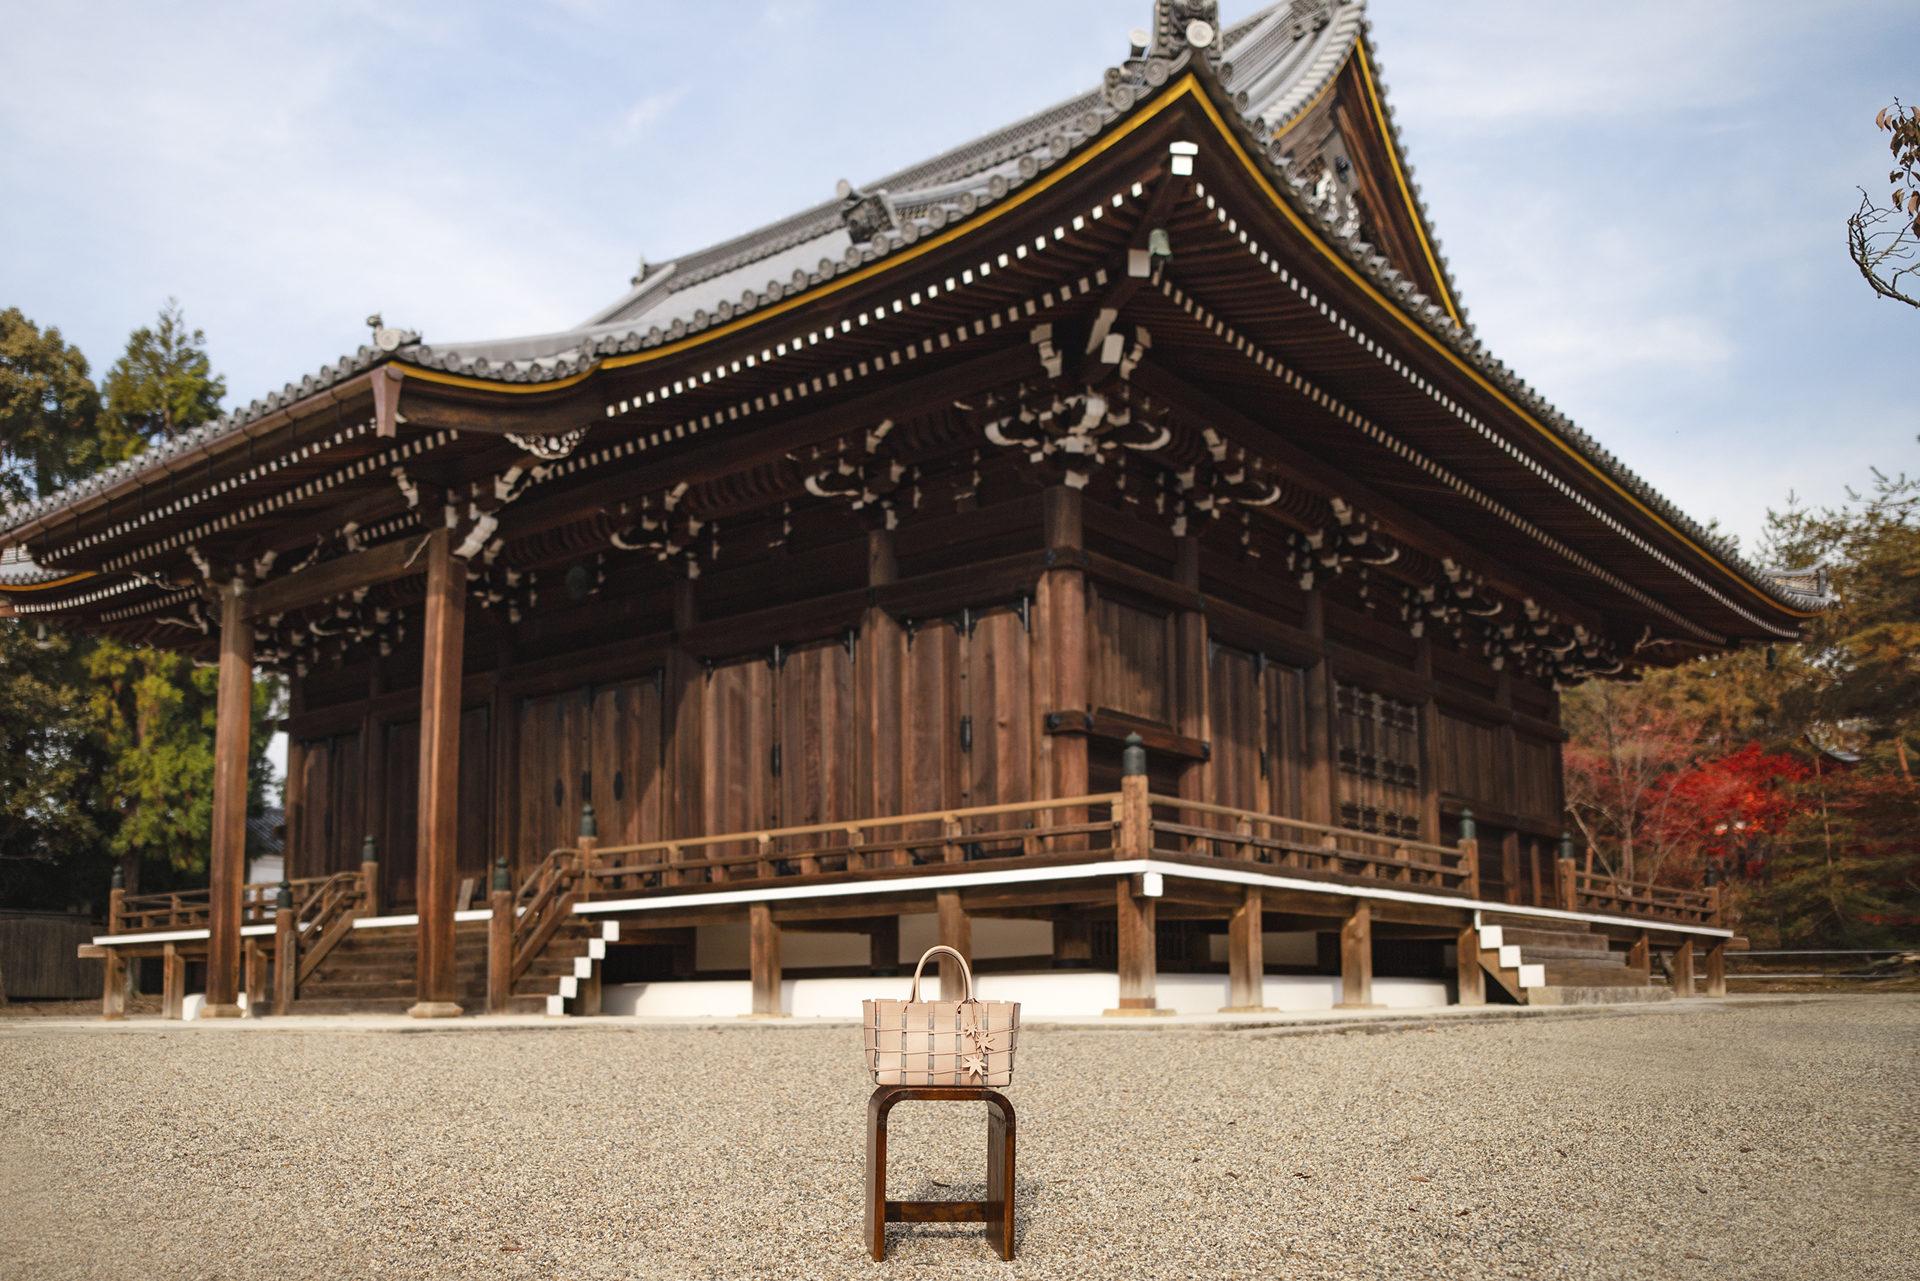 zima caede京都